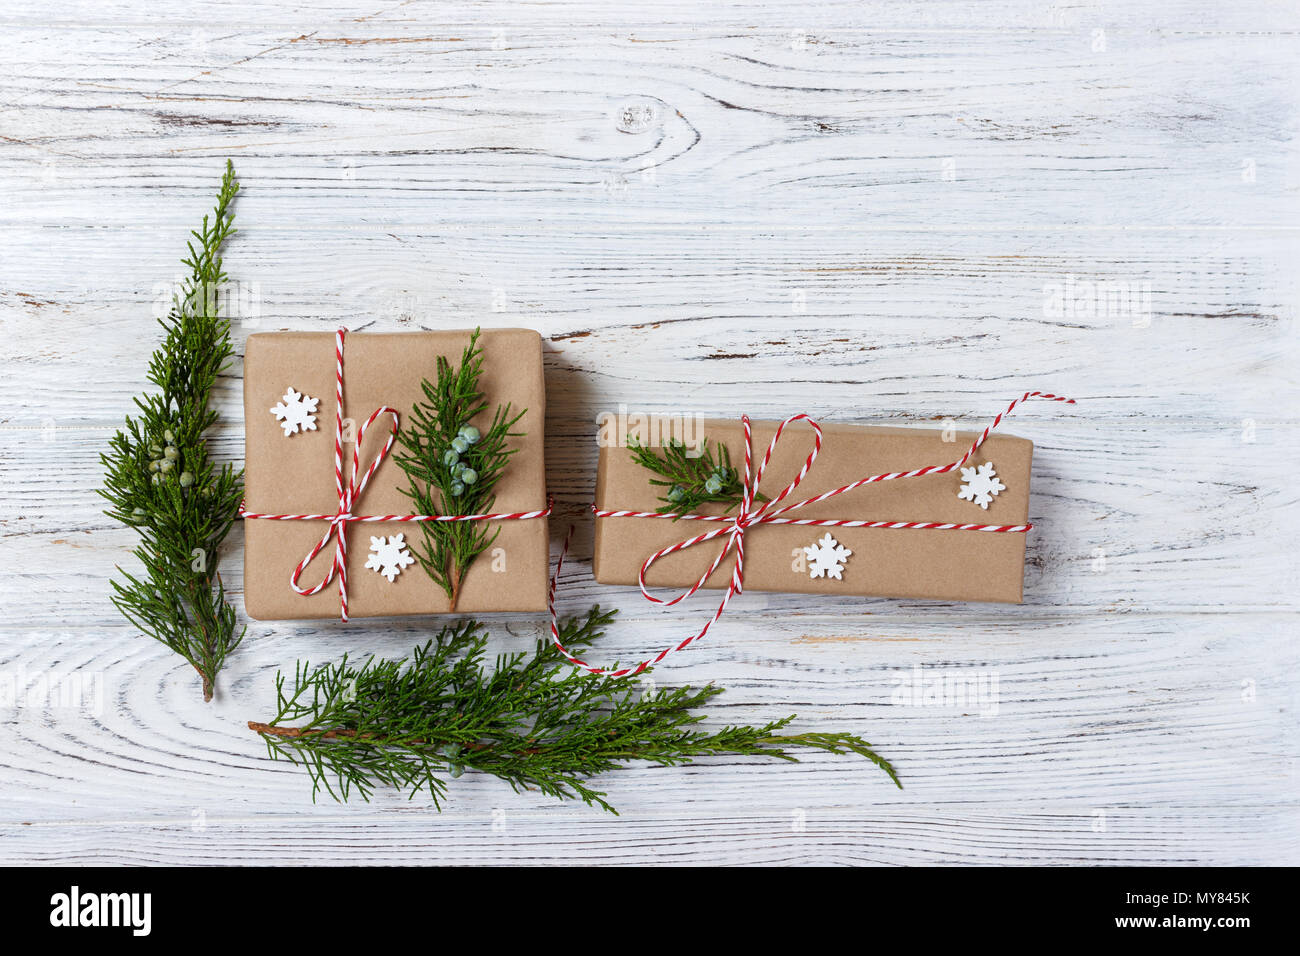 Christmas Paper Tree Craft Background Stockfotos & Christmas Paper ...